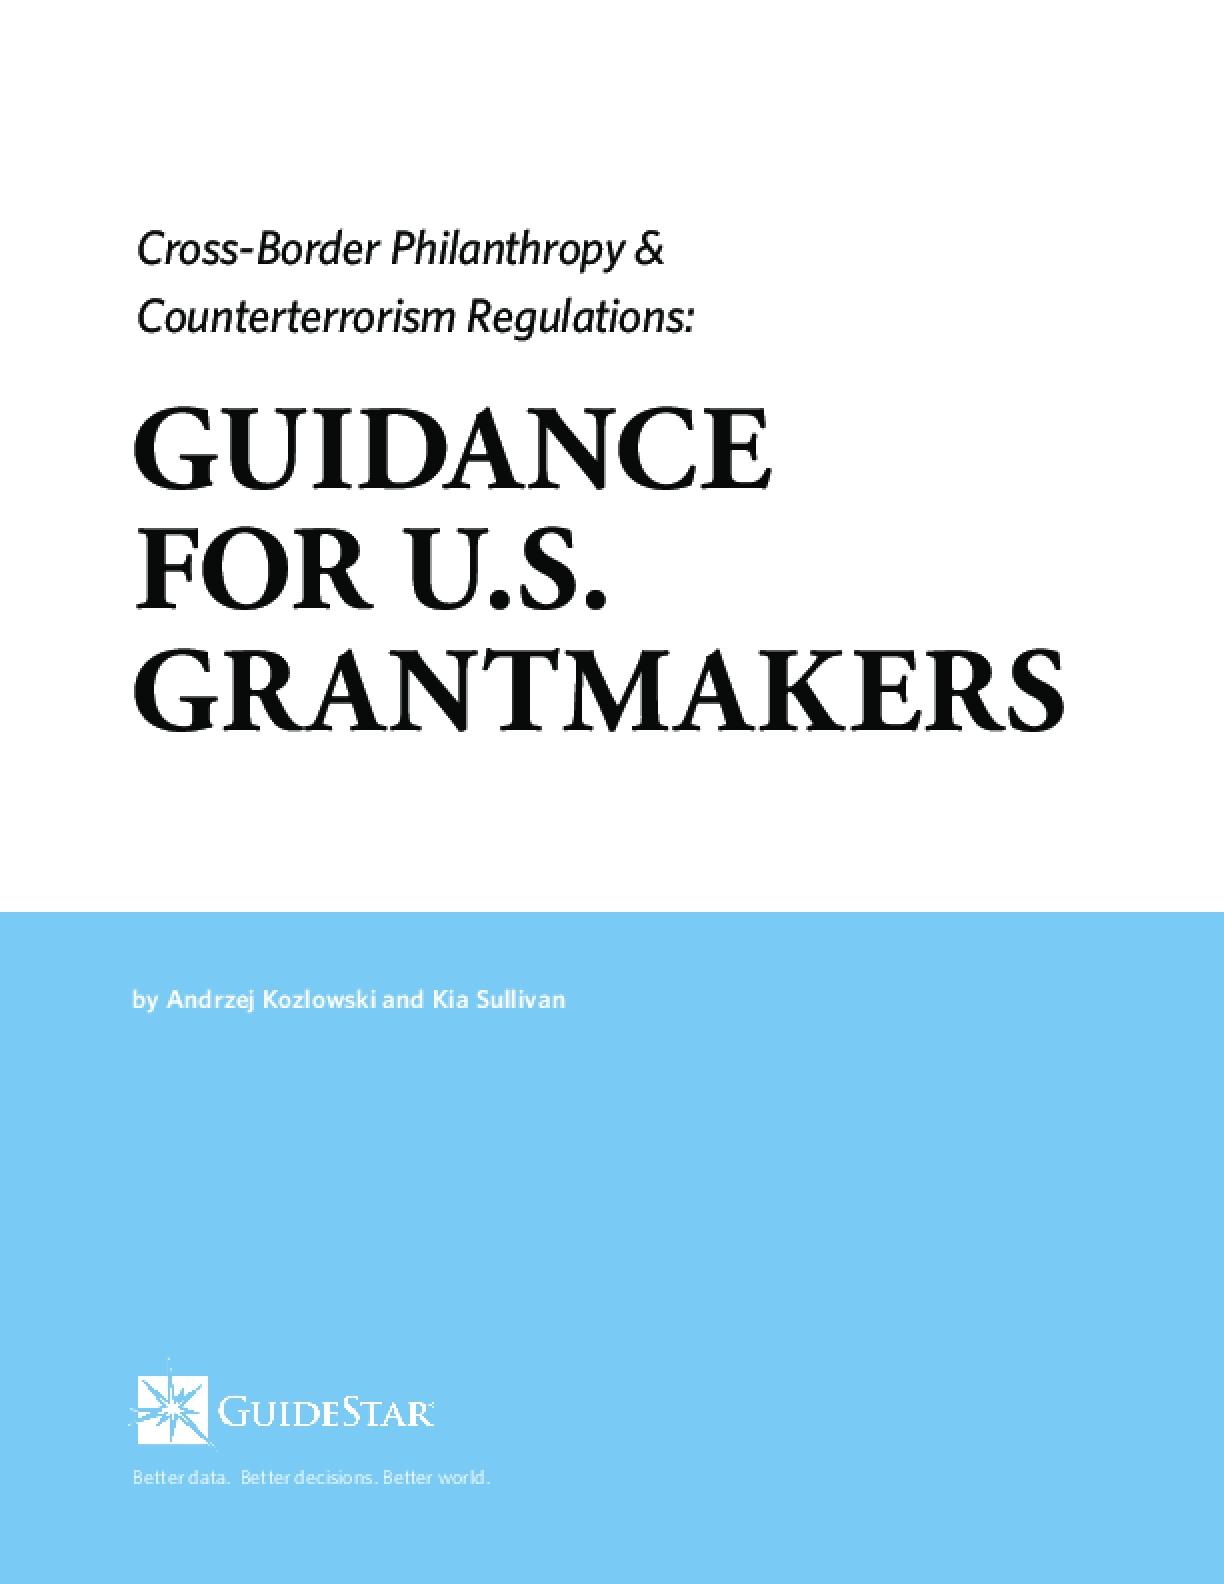 Cross-Border Philanthropy & Counterterrorism Regulations: Guidance for U.S. Grantmakers